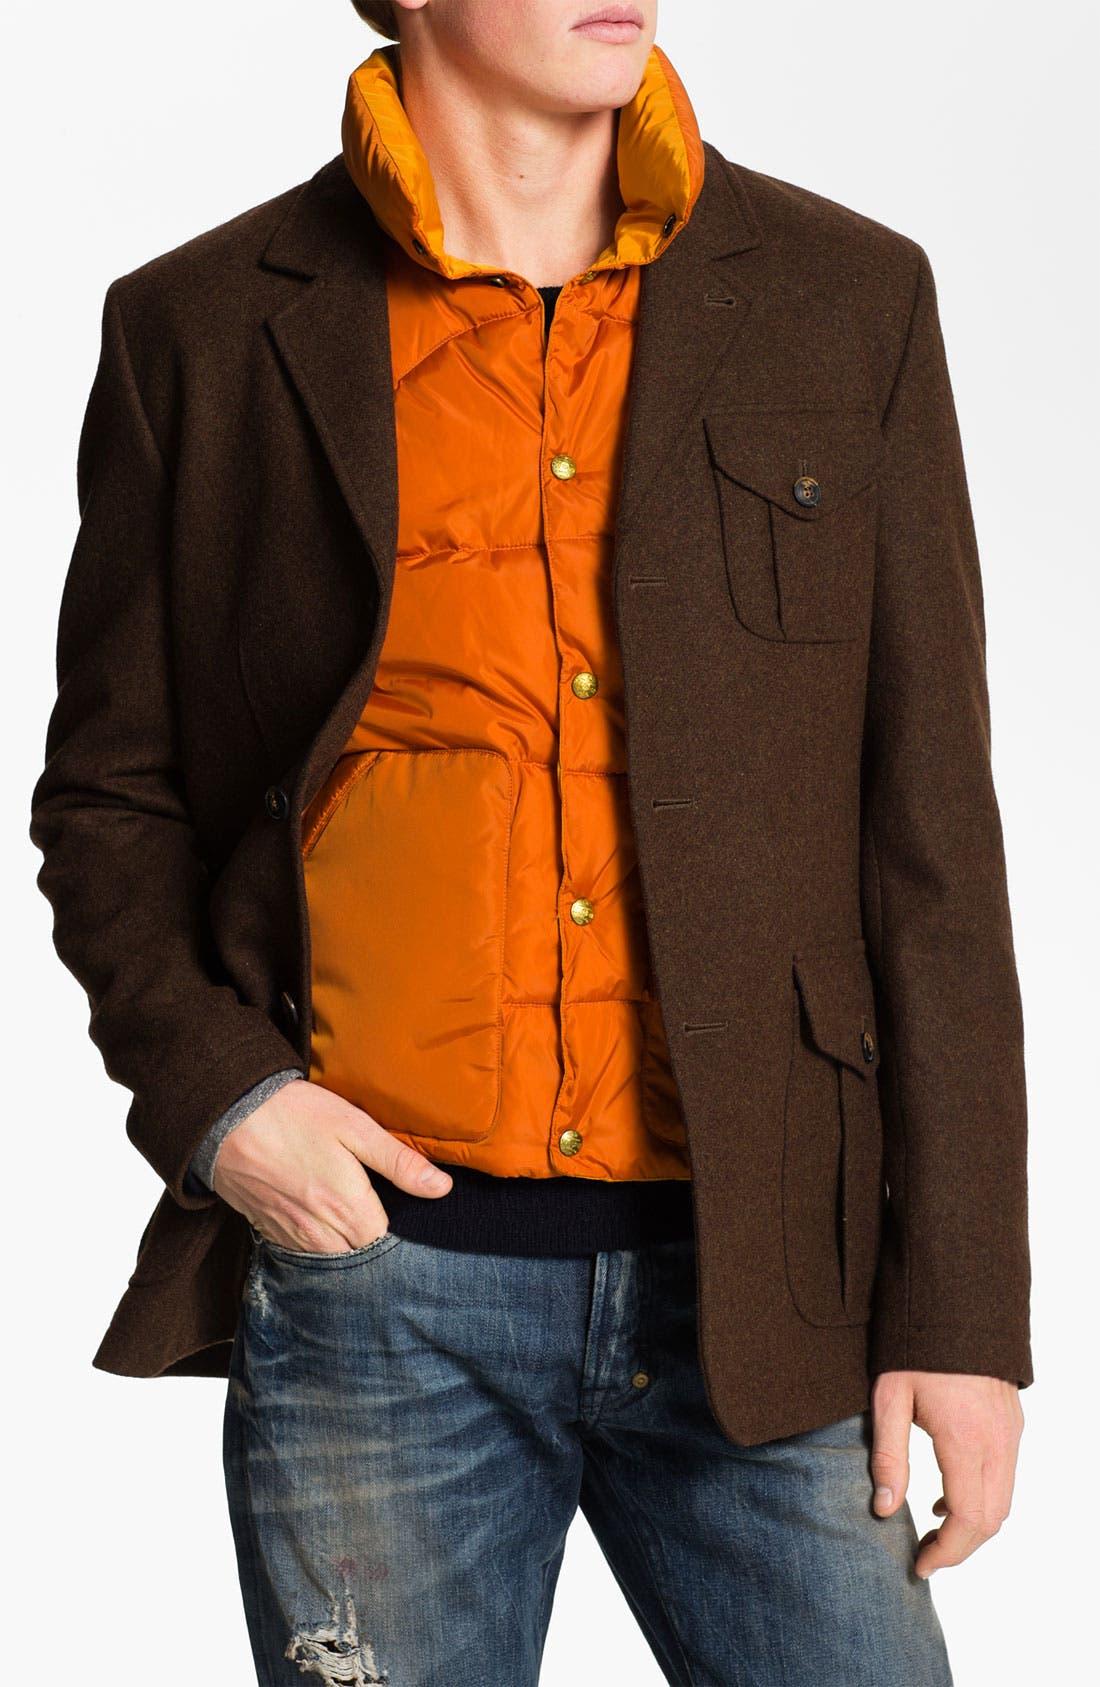 Main Image - Scotch & Soda Hunting Blazer with Removable Vest